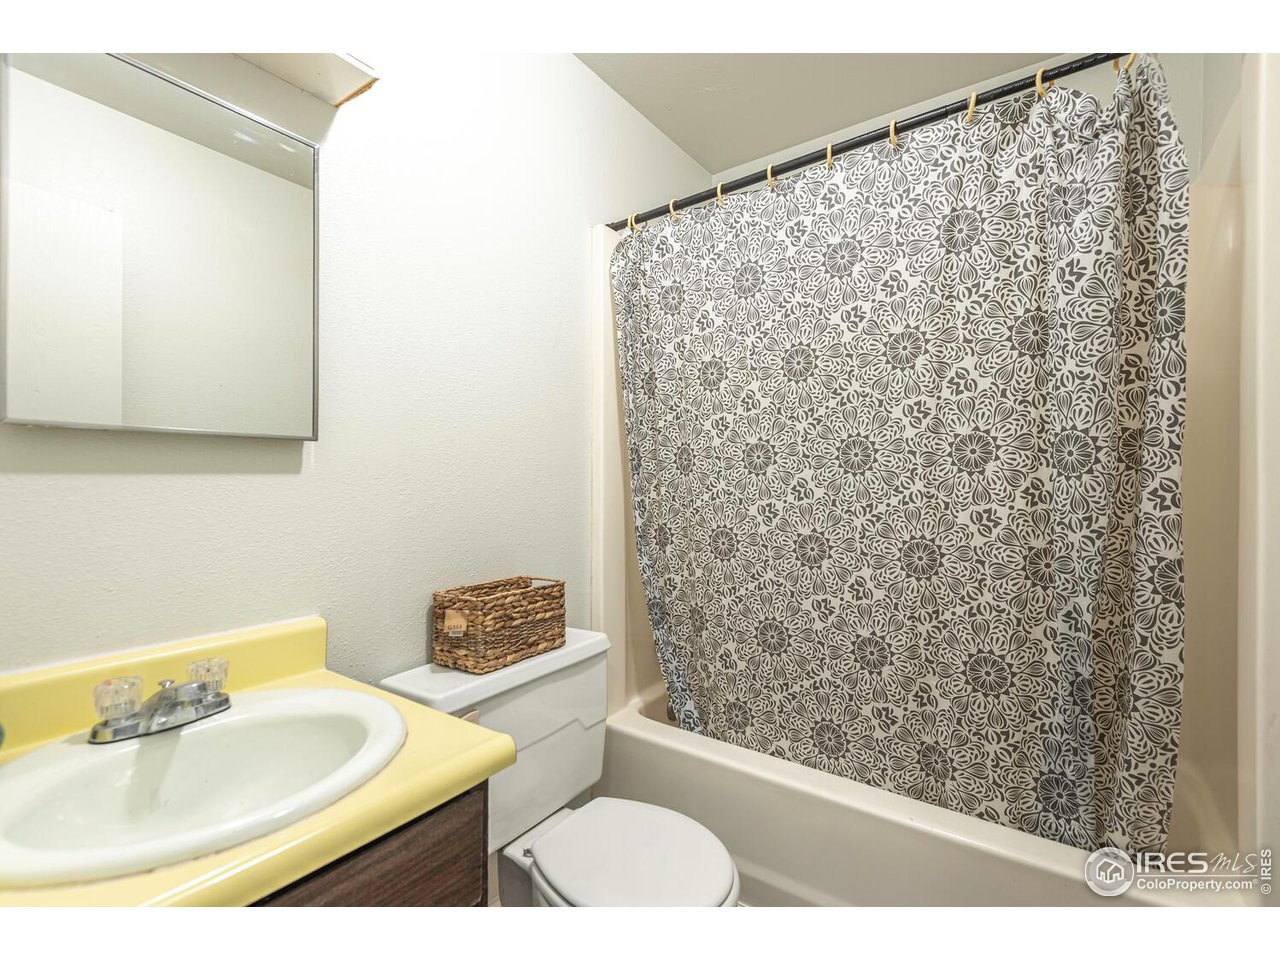 Full bath located on upper level